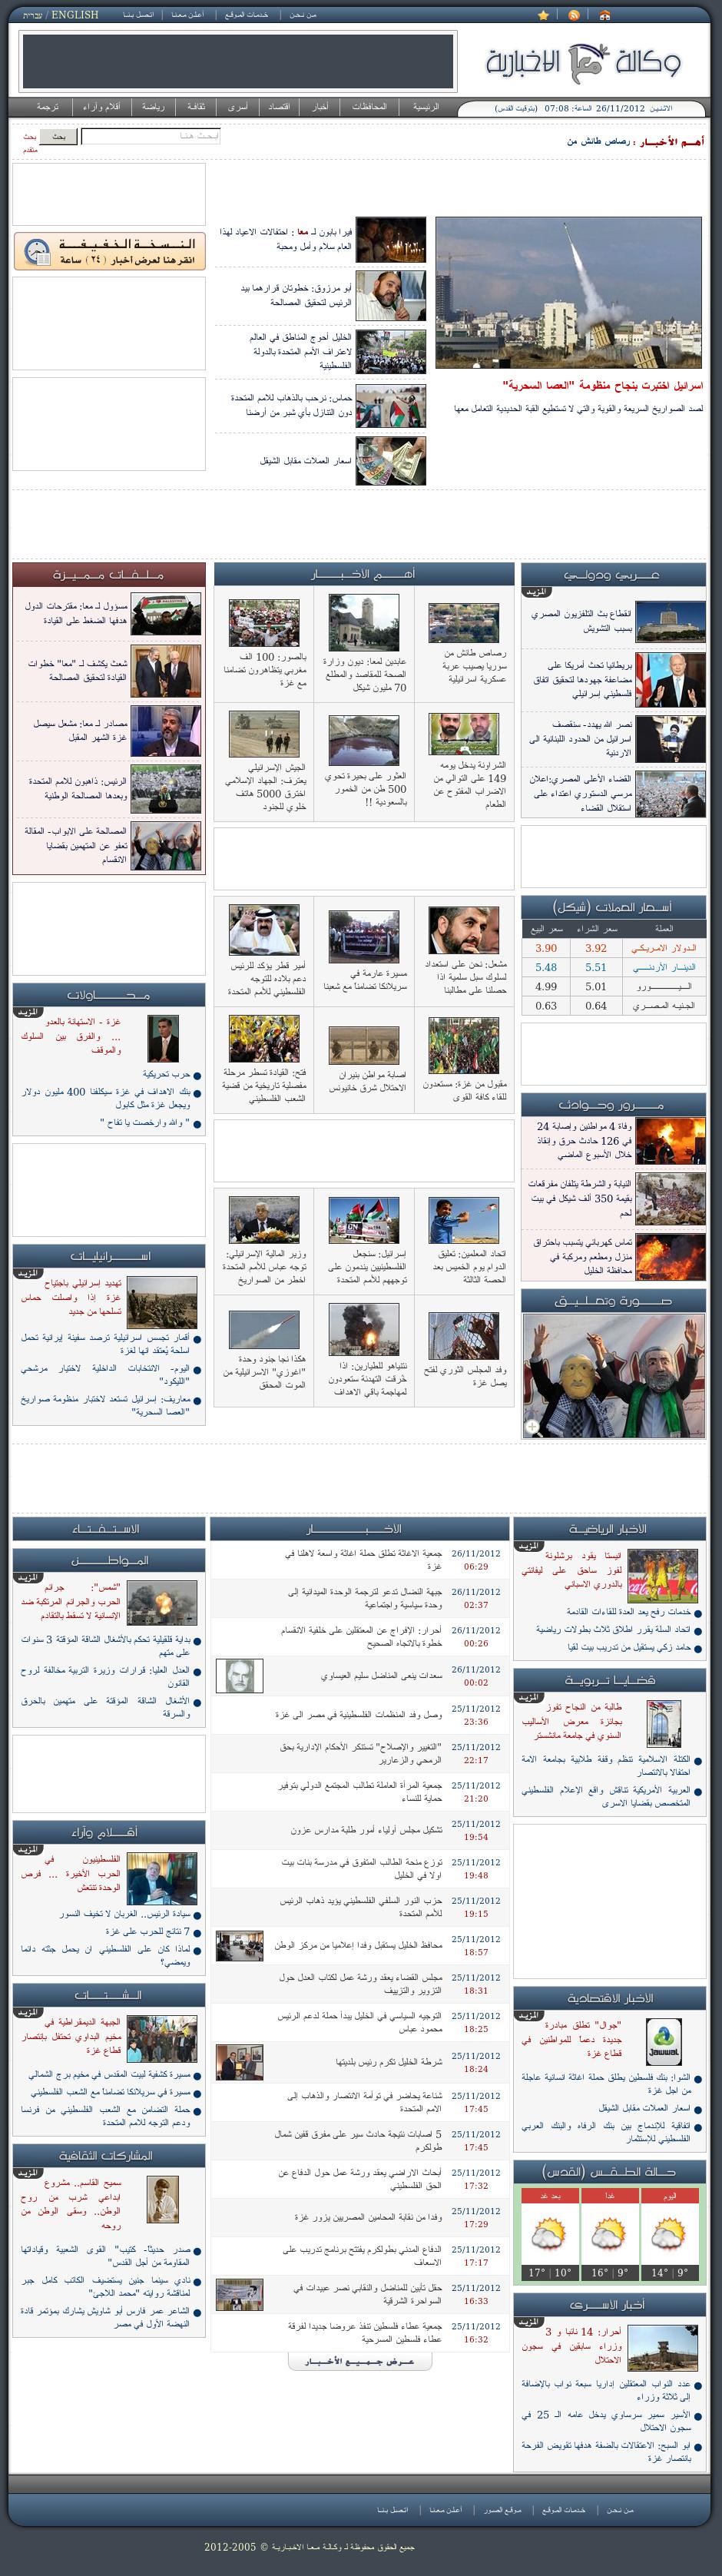 Ma'an News at Monday Nov. 26, 2012, 5:14 a.m. UTC